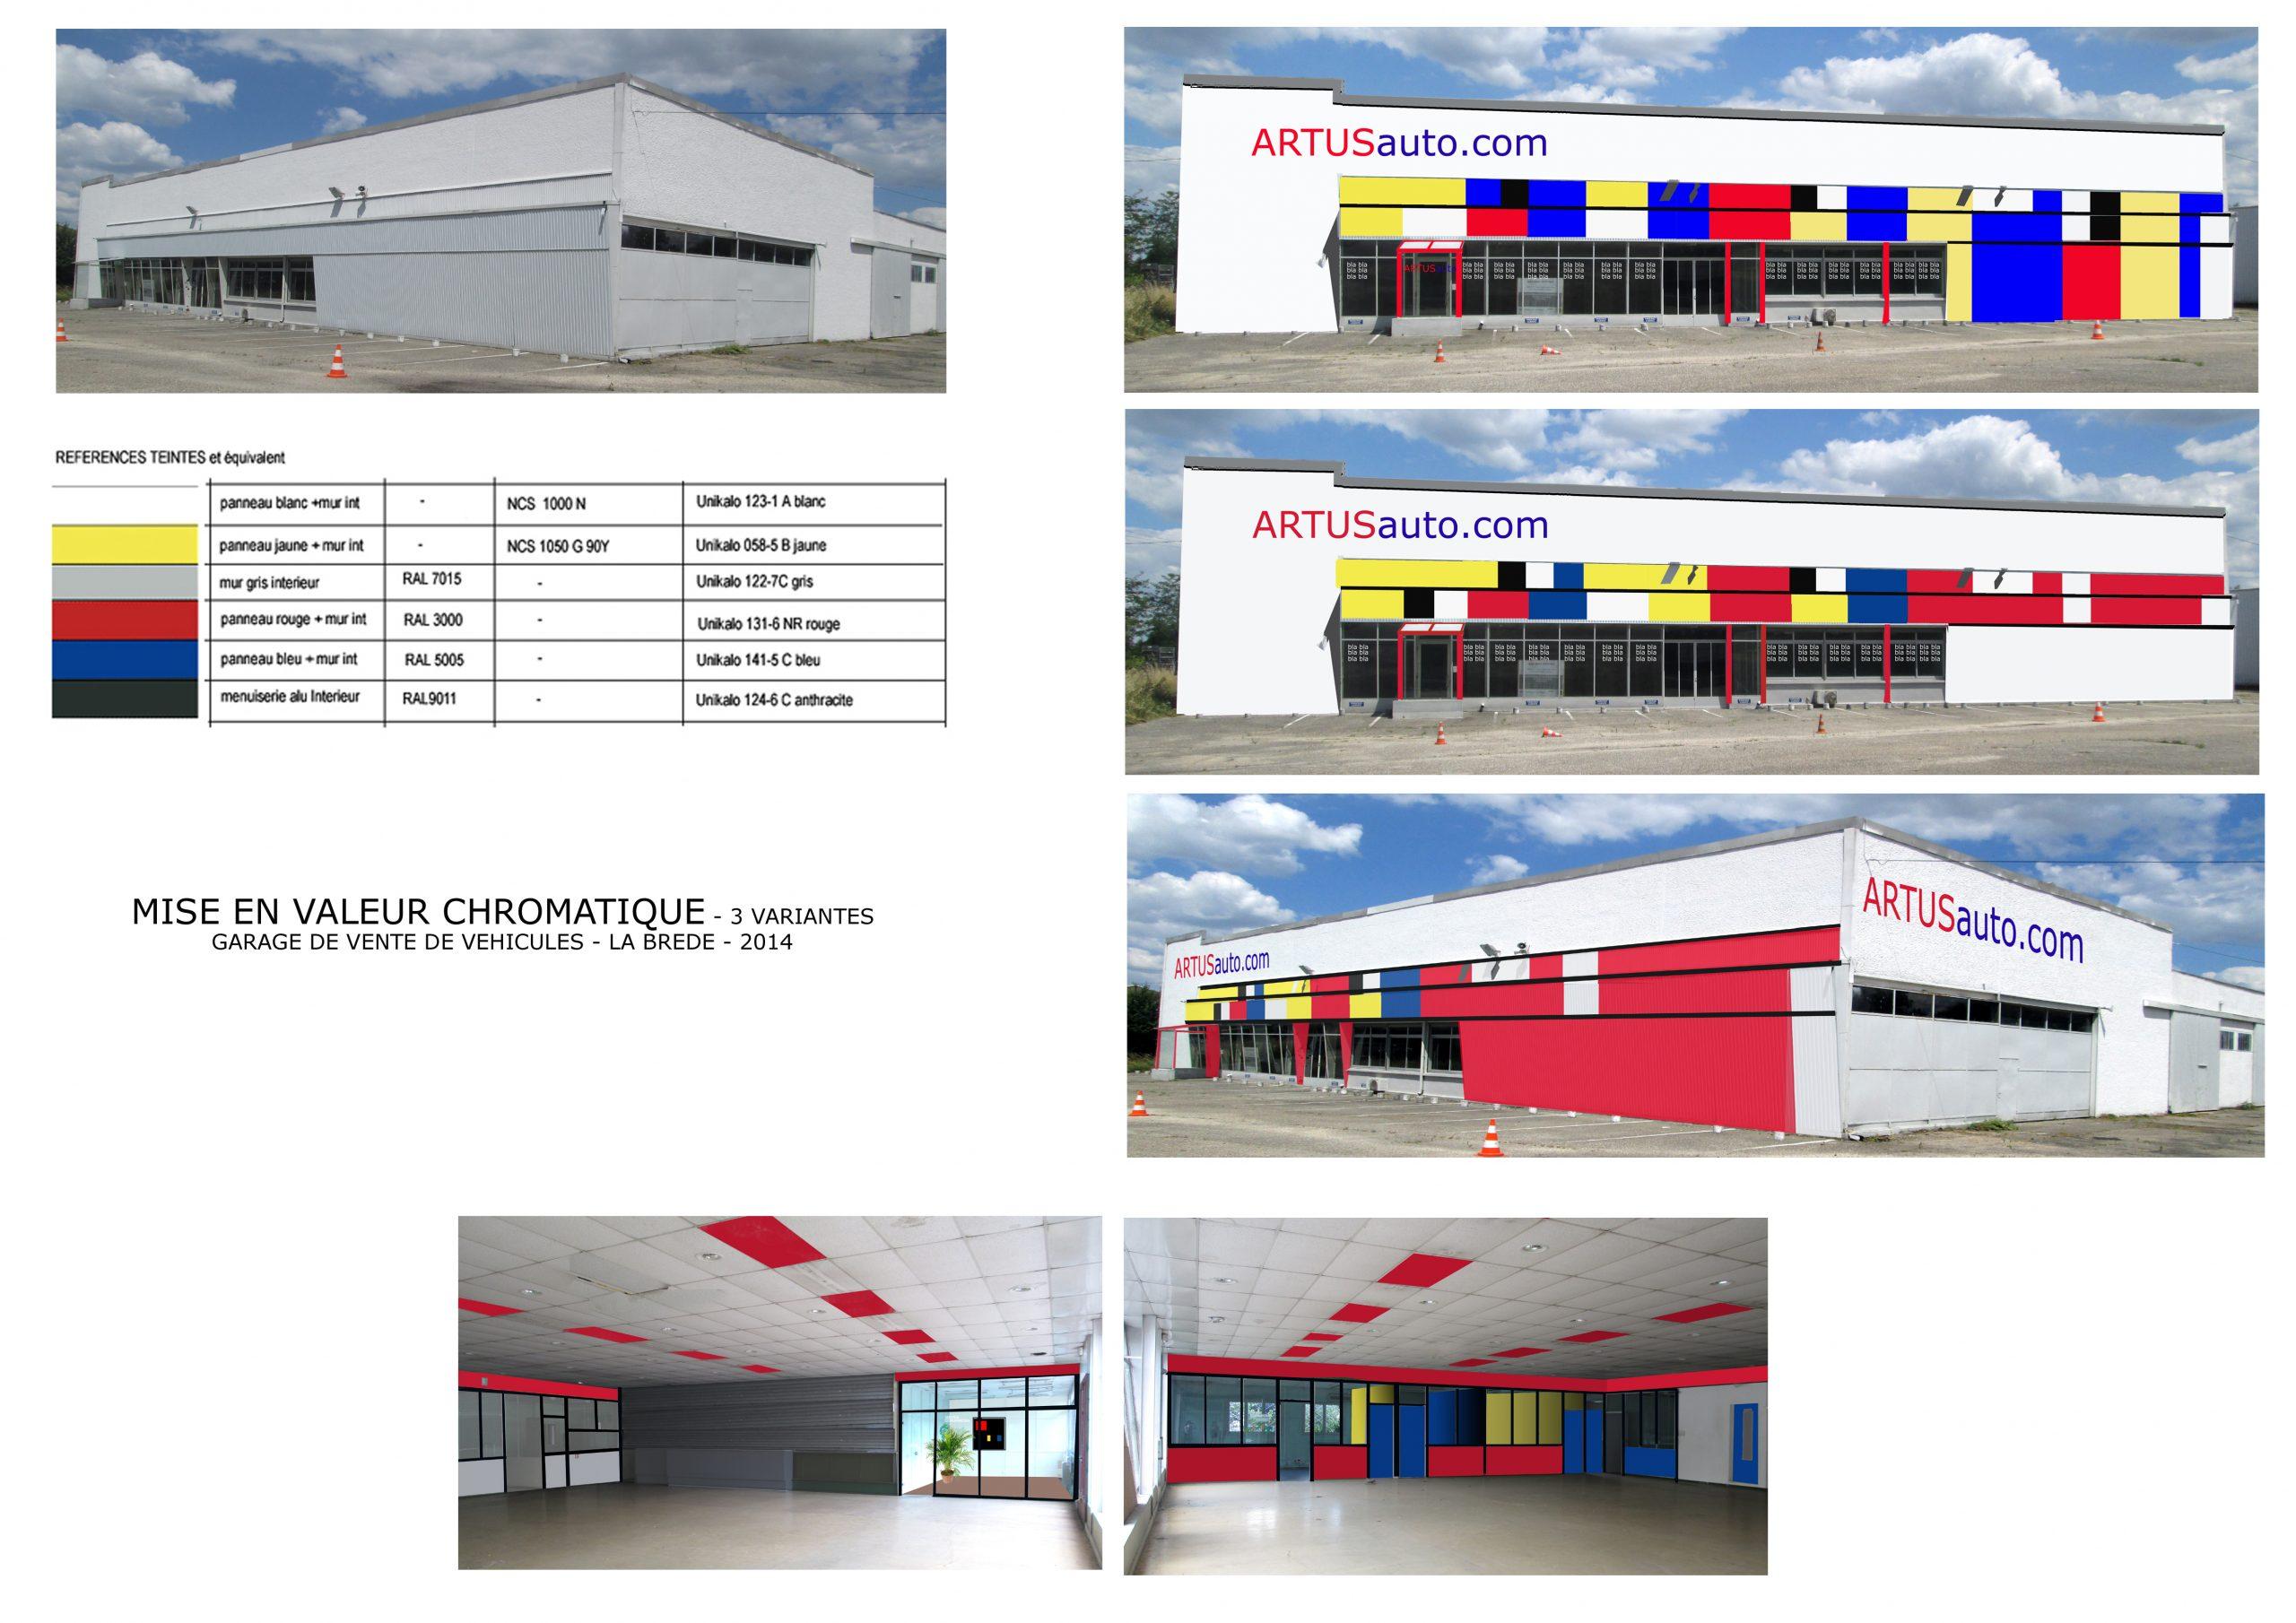 Garage Artus Auto.com- Polychromie architecturale